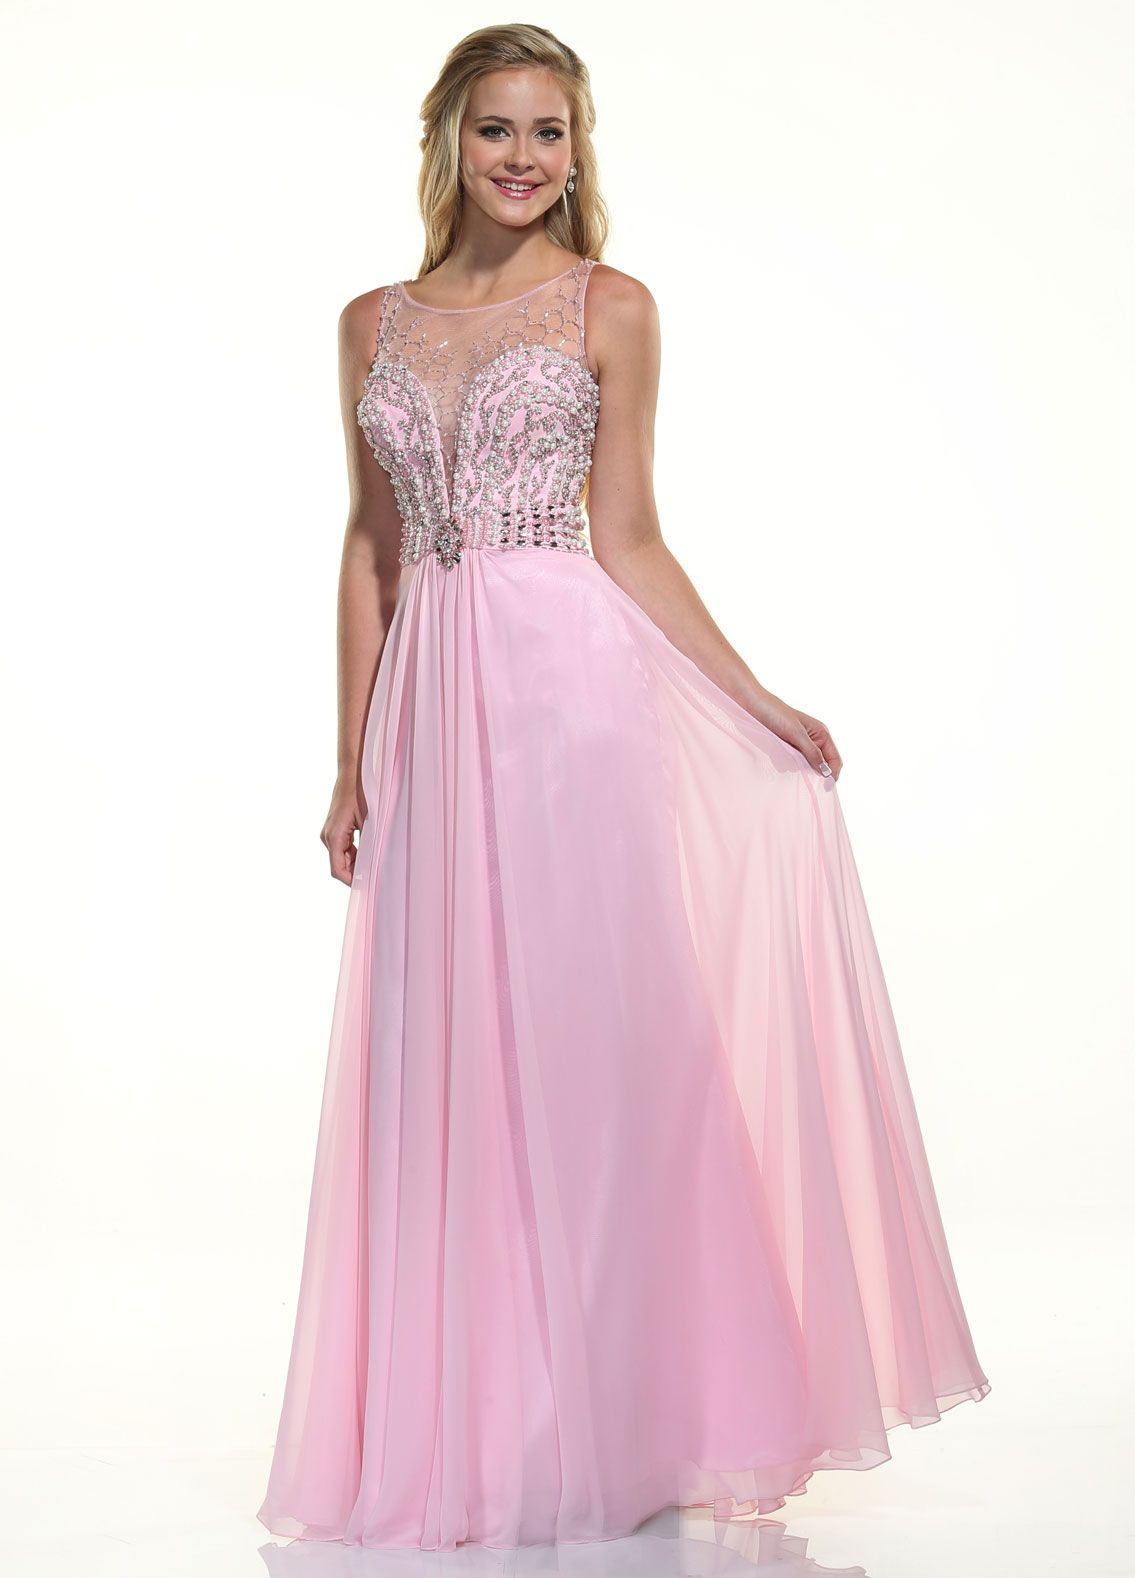 Disney Forever Enchanted Prom Dresses | Impression Prom wear 2015 ...